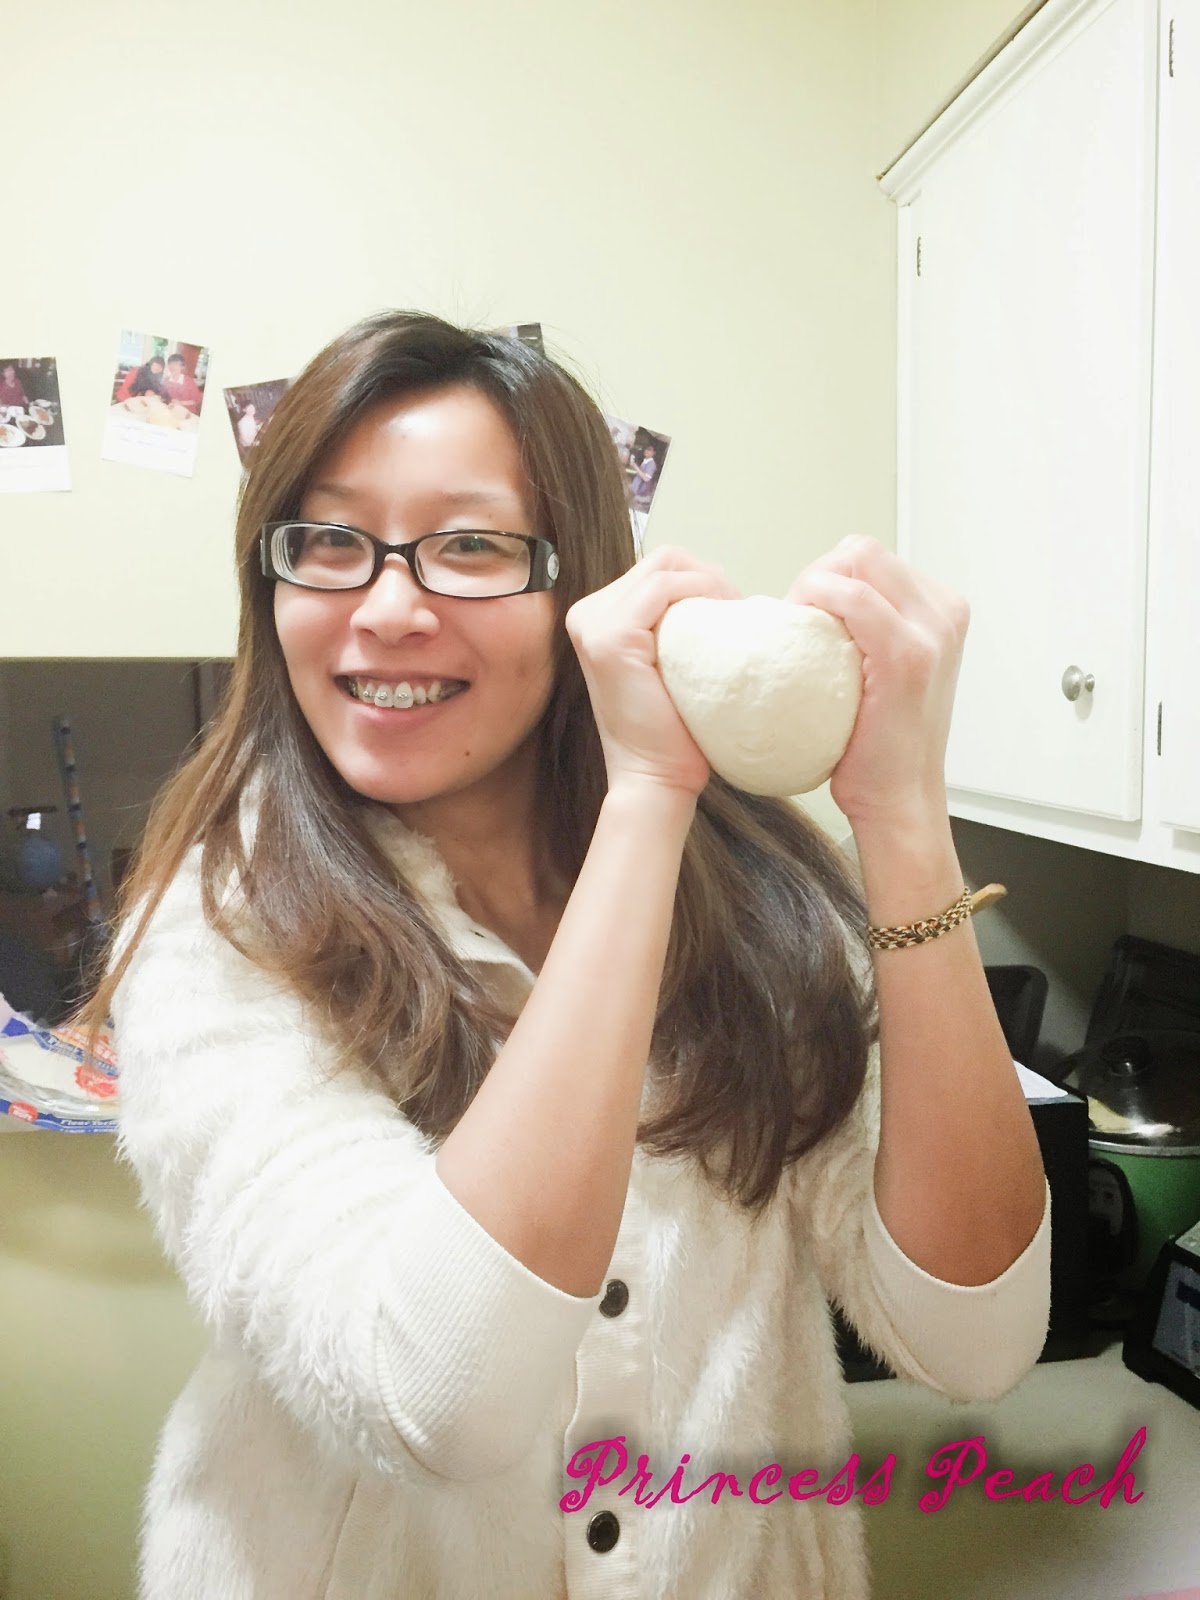 http://twpeach.blogspot.com/2014/12/pregnancy-diary18.html